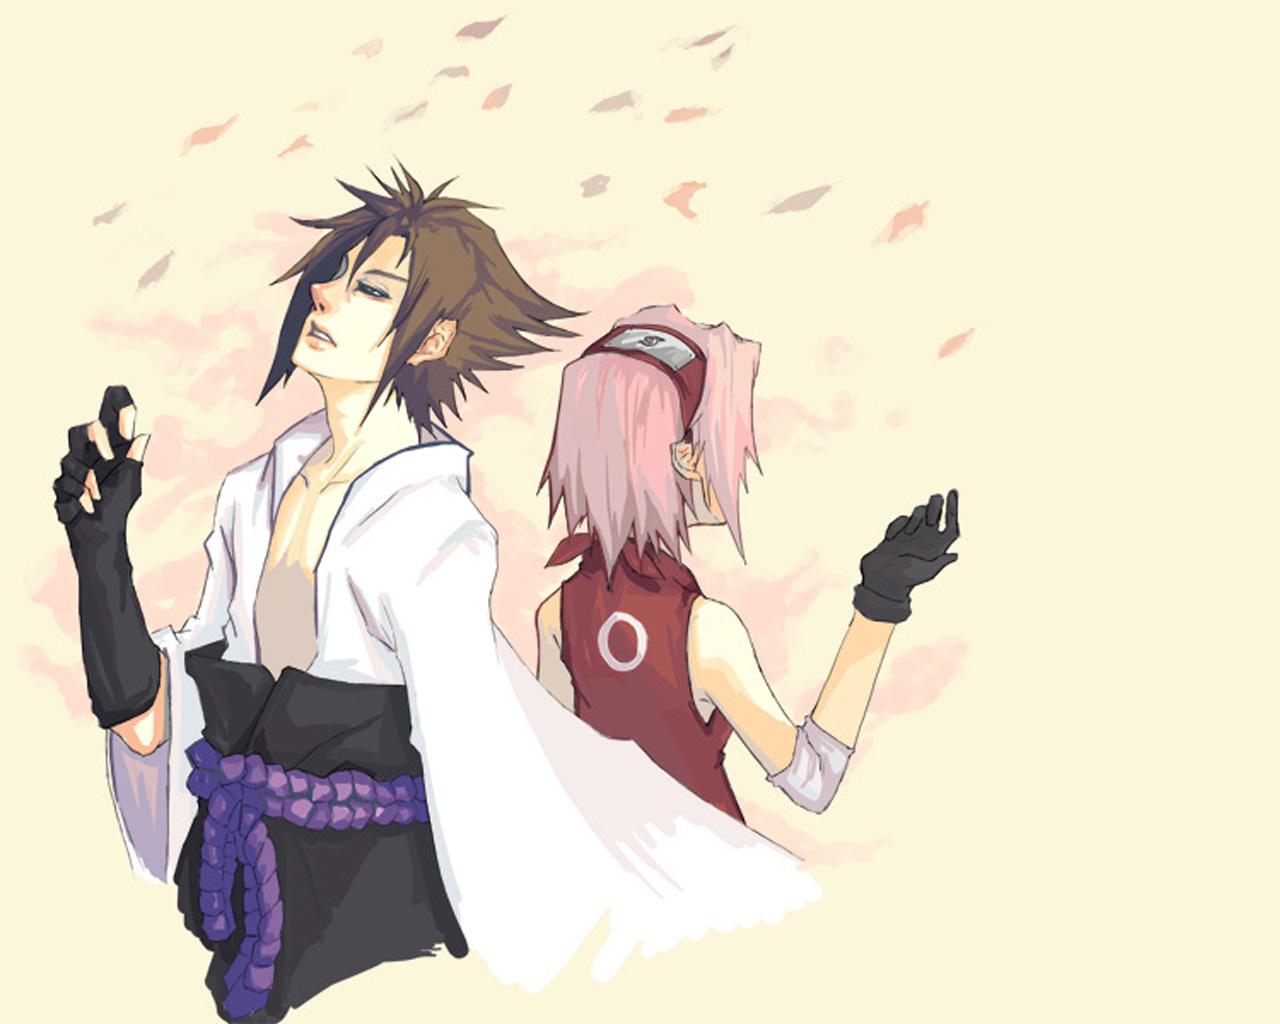 саске и сакура трахаются картинки